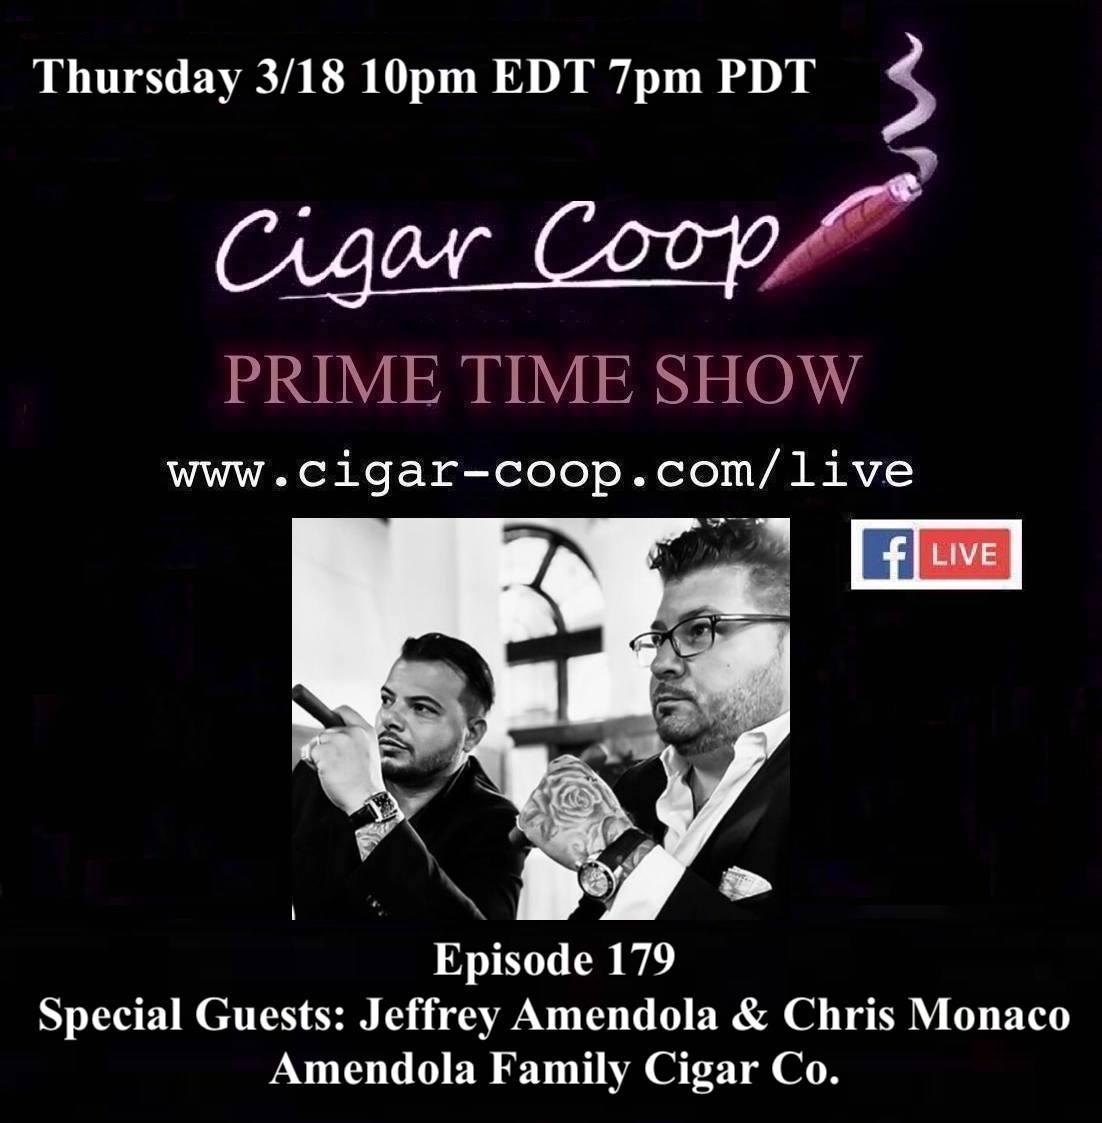 Announcement: Prime Time Episode 179: Jeffrey Amendola & Chris Monaco, Amendola Family Cigar Co.